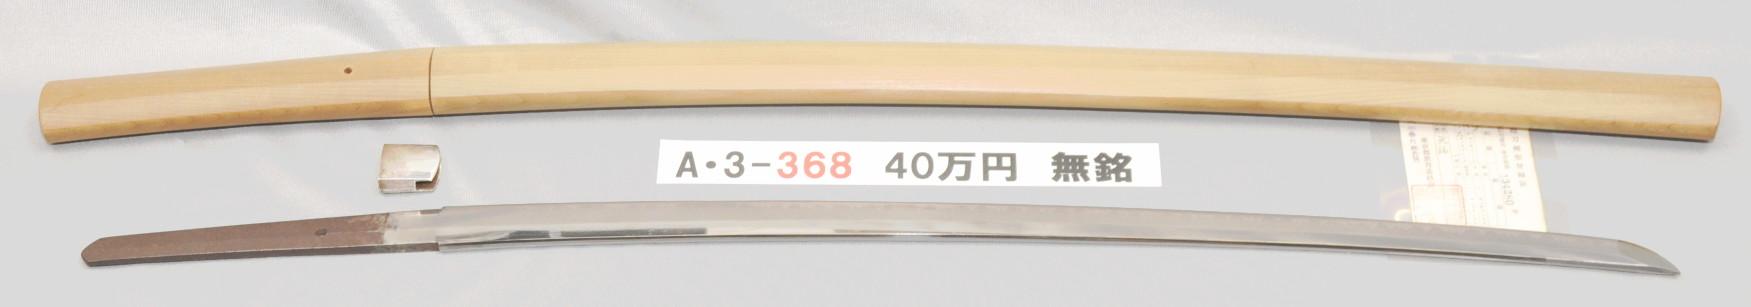 A3368